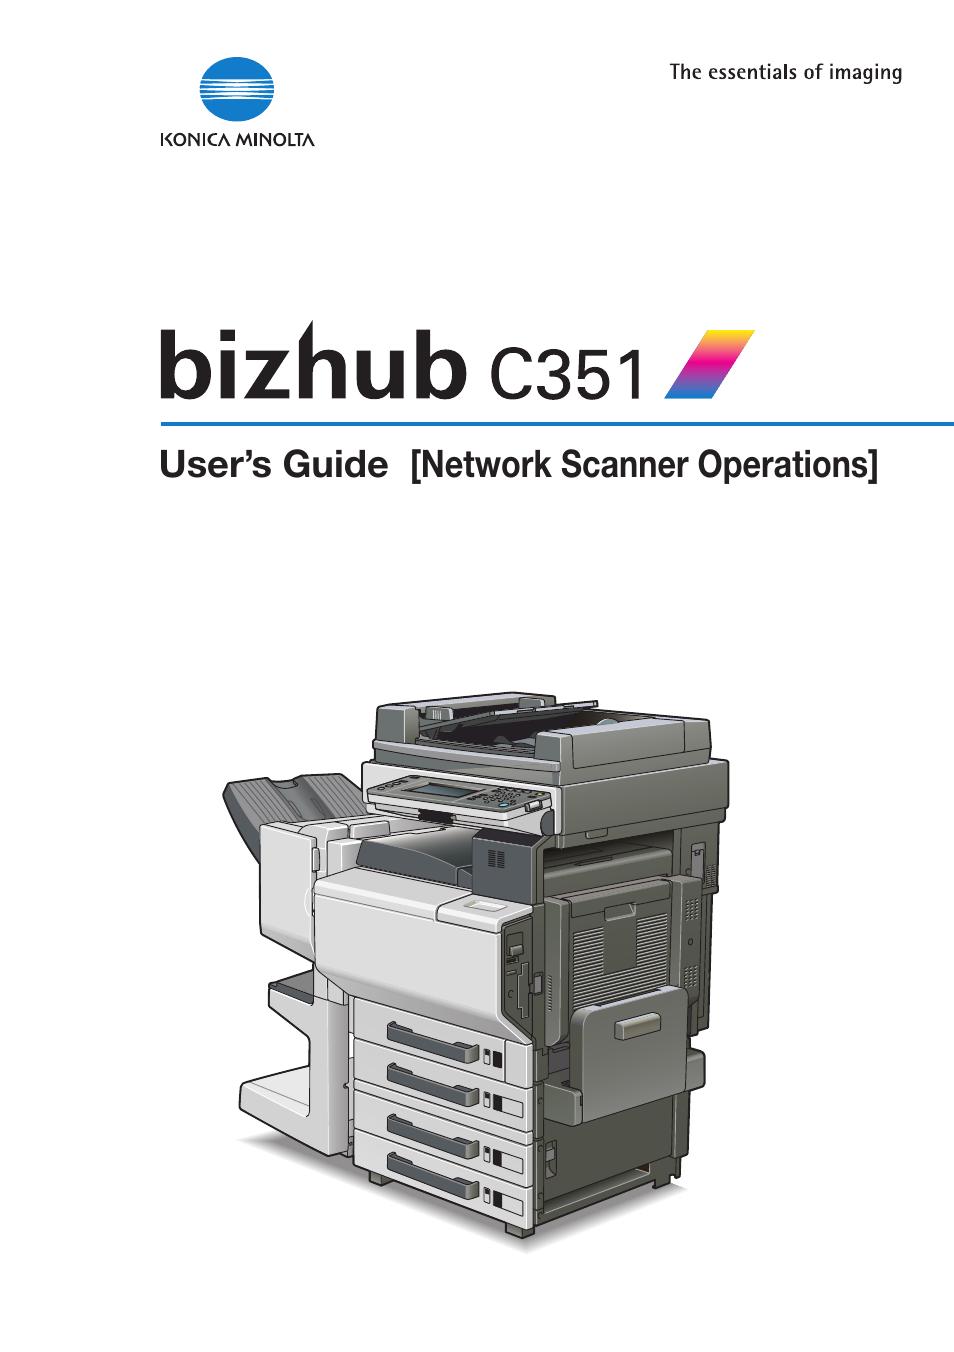 konica minolta bizhub c351 user manual 396 pages rh manualsdir com Konica C35 Konica C360